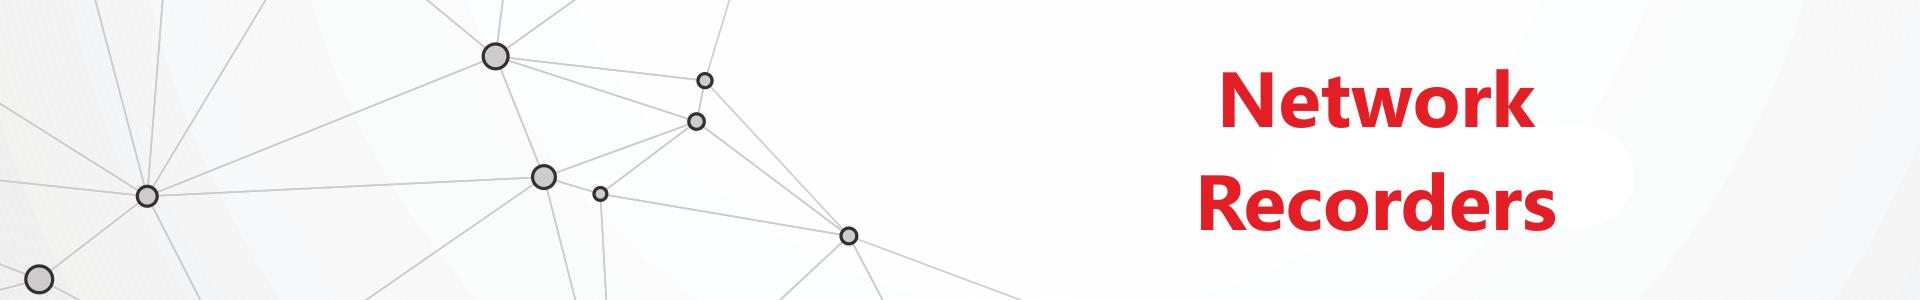 Network-Recorders